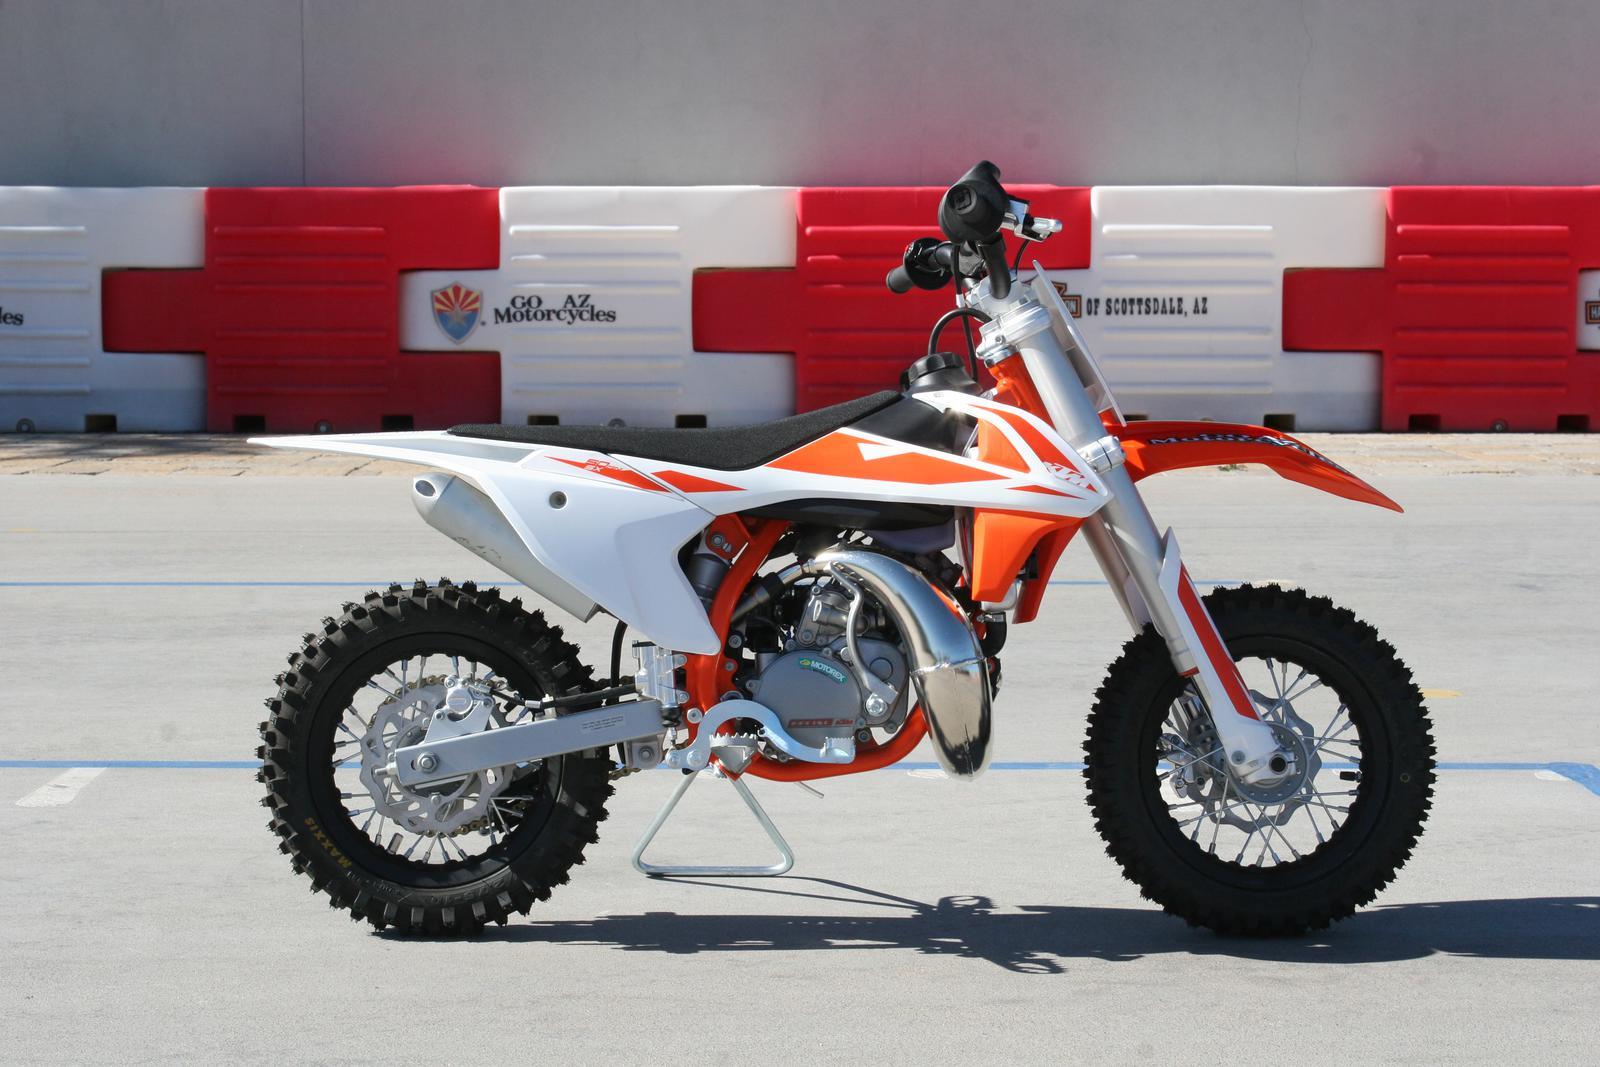 2019 KTM 50 SX MINI for sale in Scottsdale, AZ | GO AZ